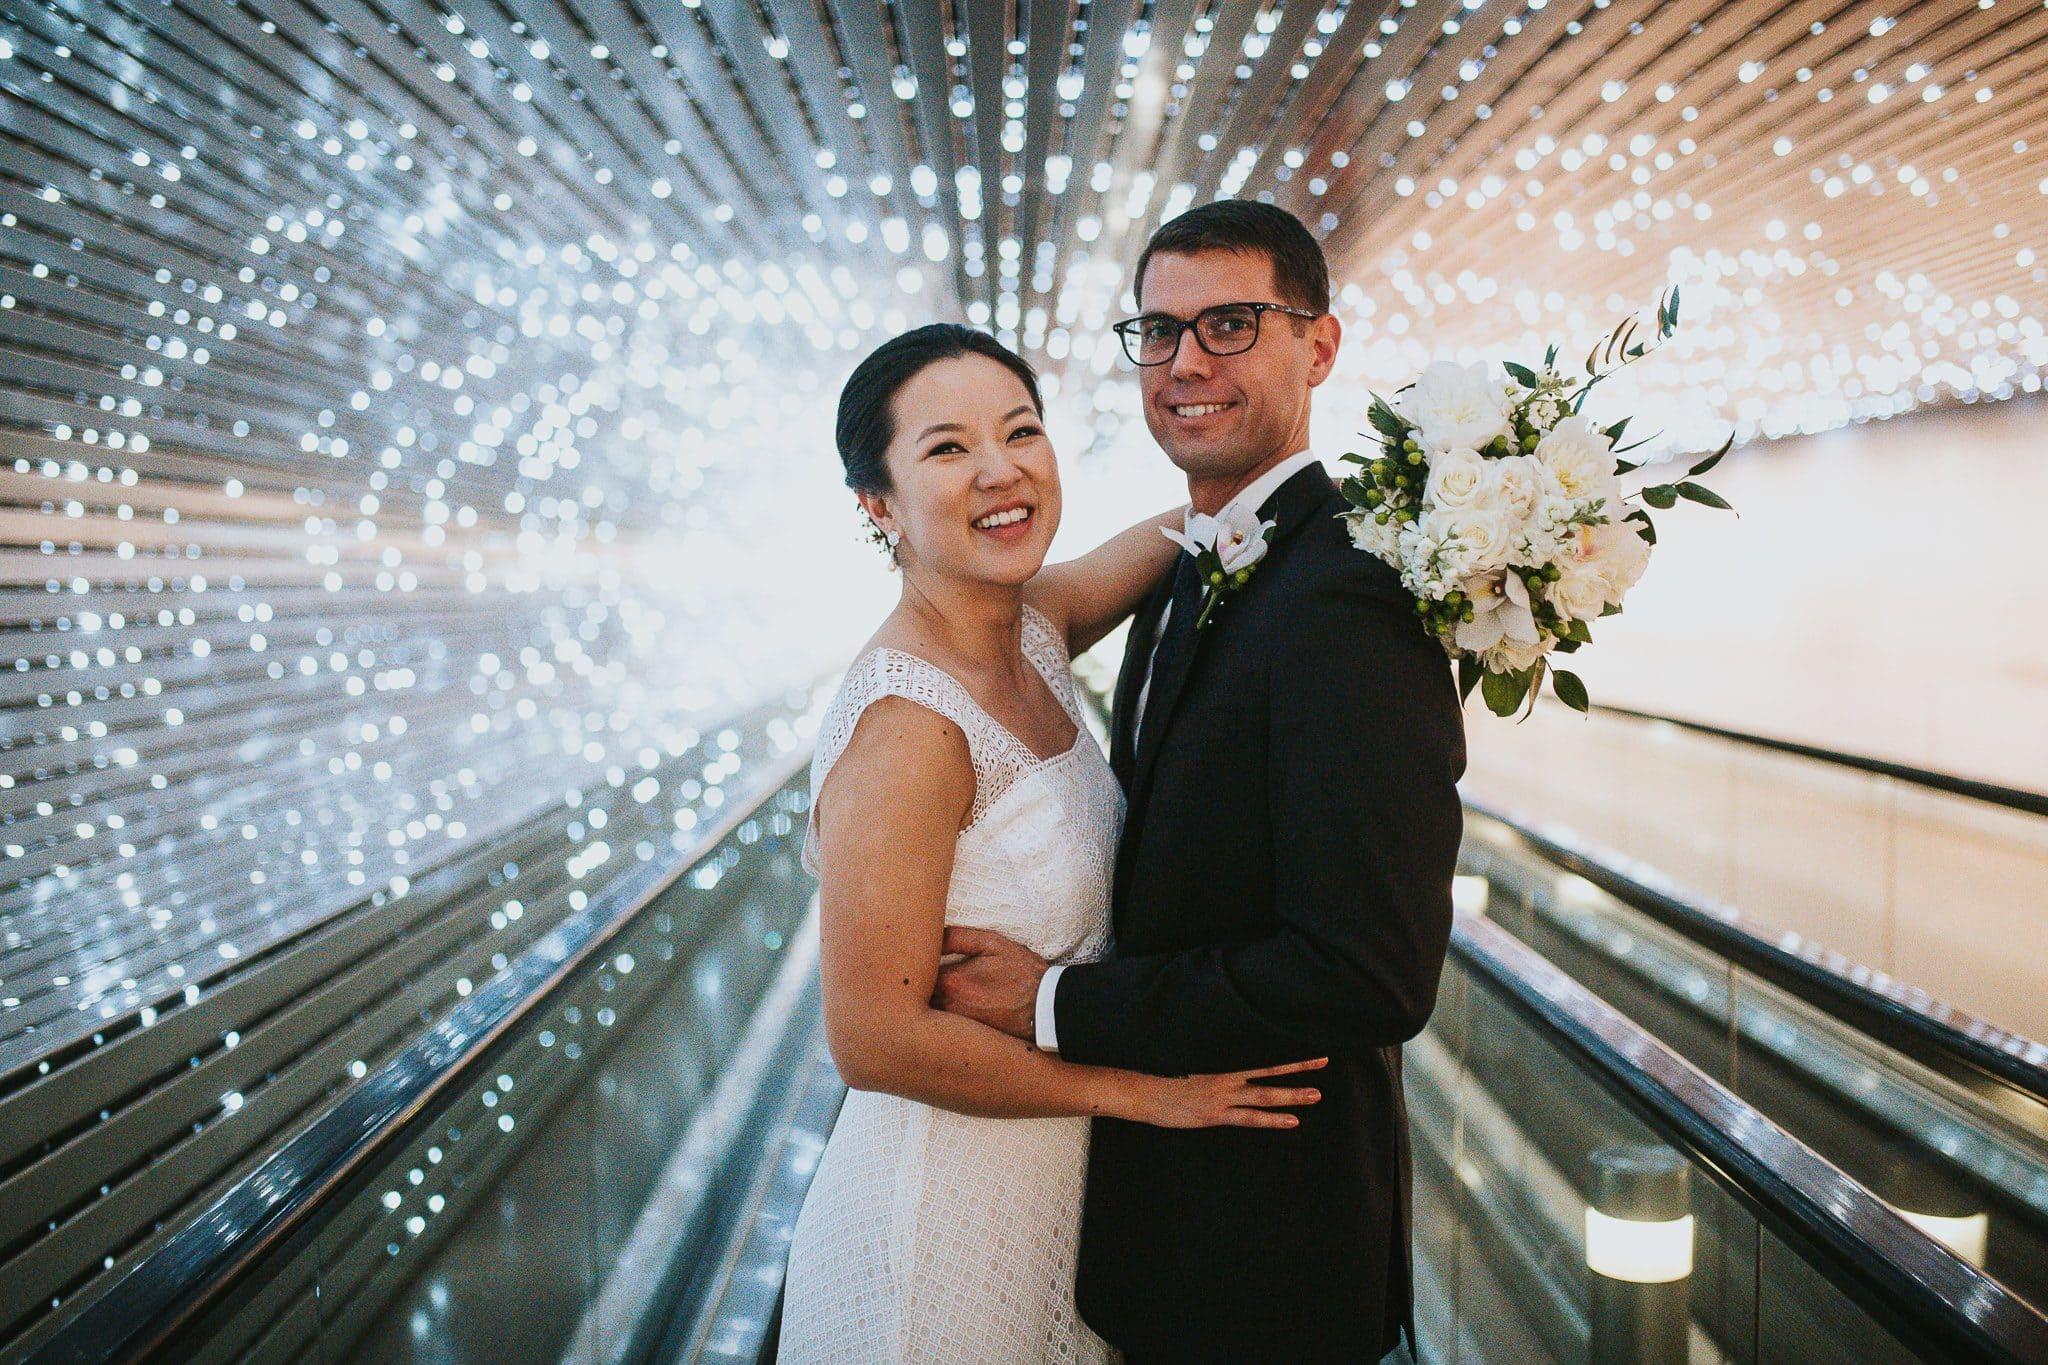 National Gallery of Art Wedding